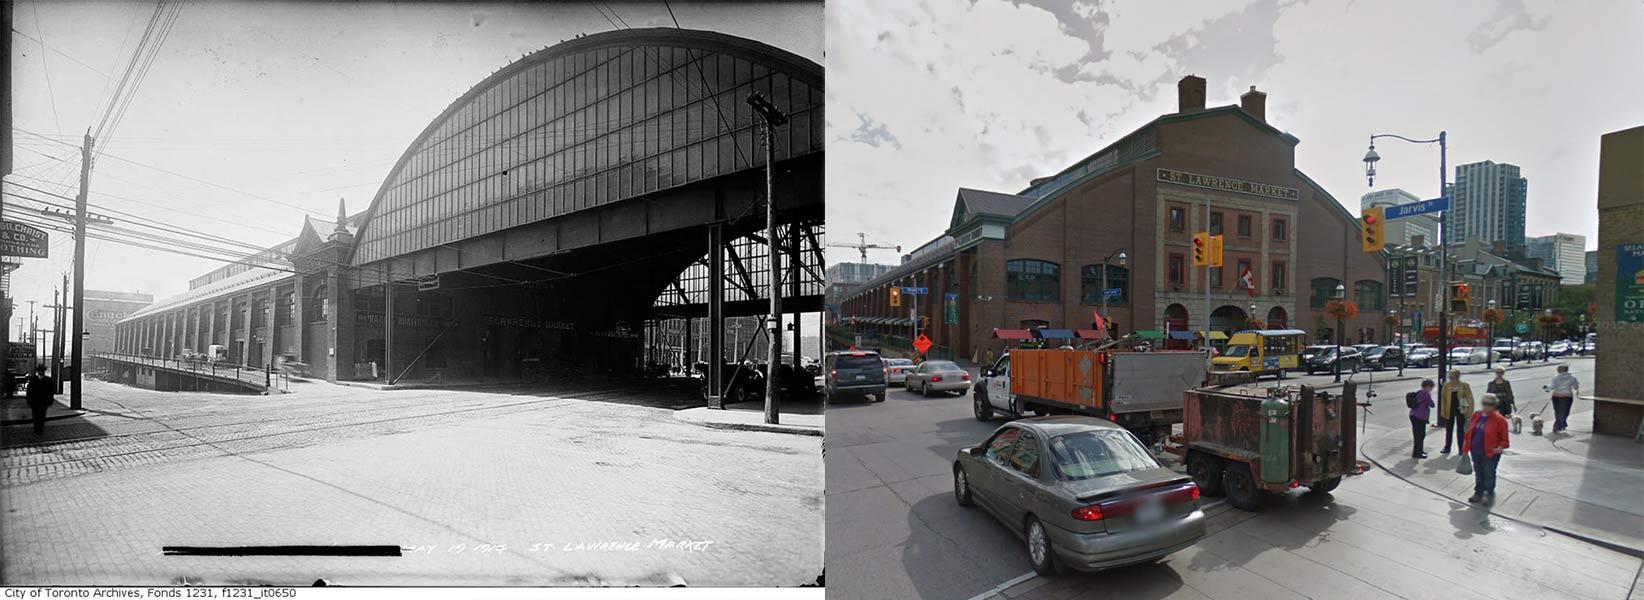 St Lawrence Market Toronto  1914 vs 2013